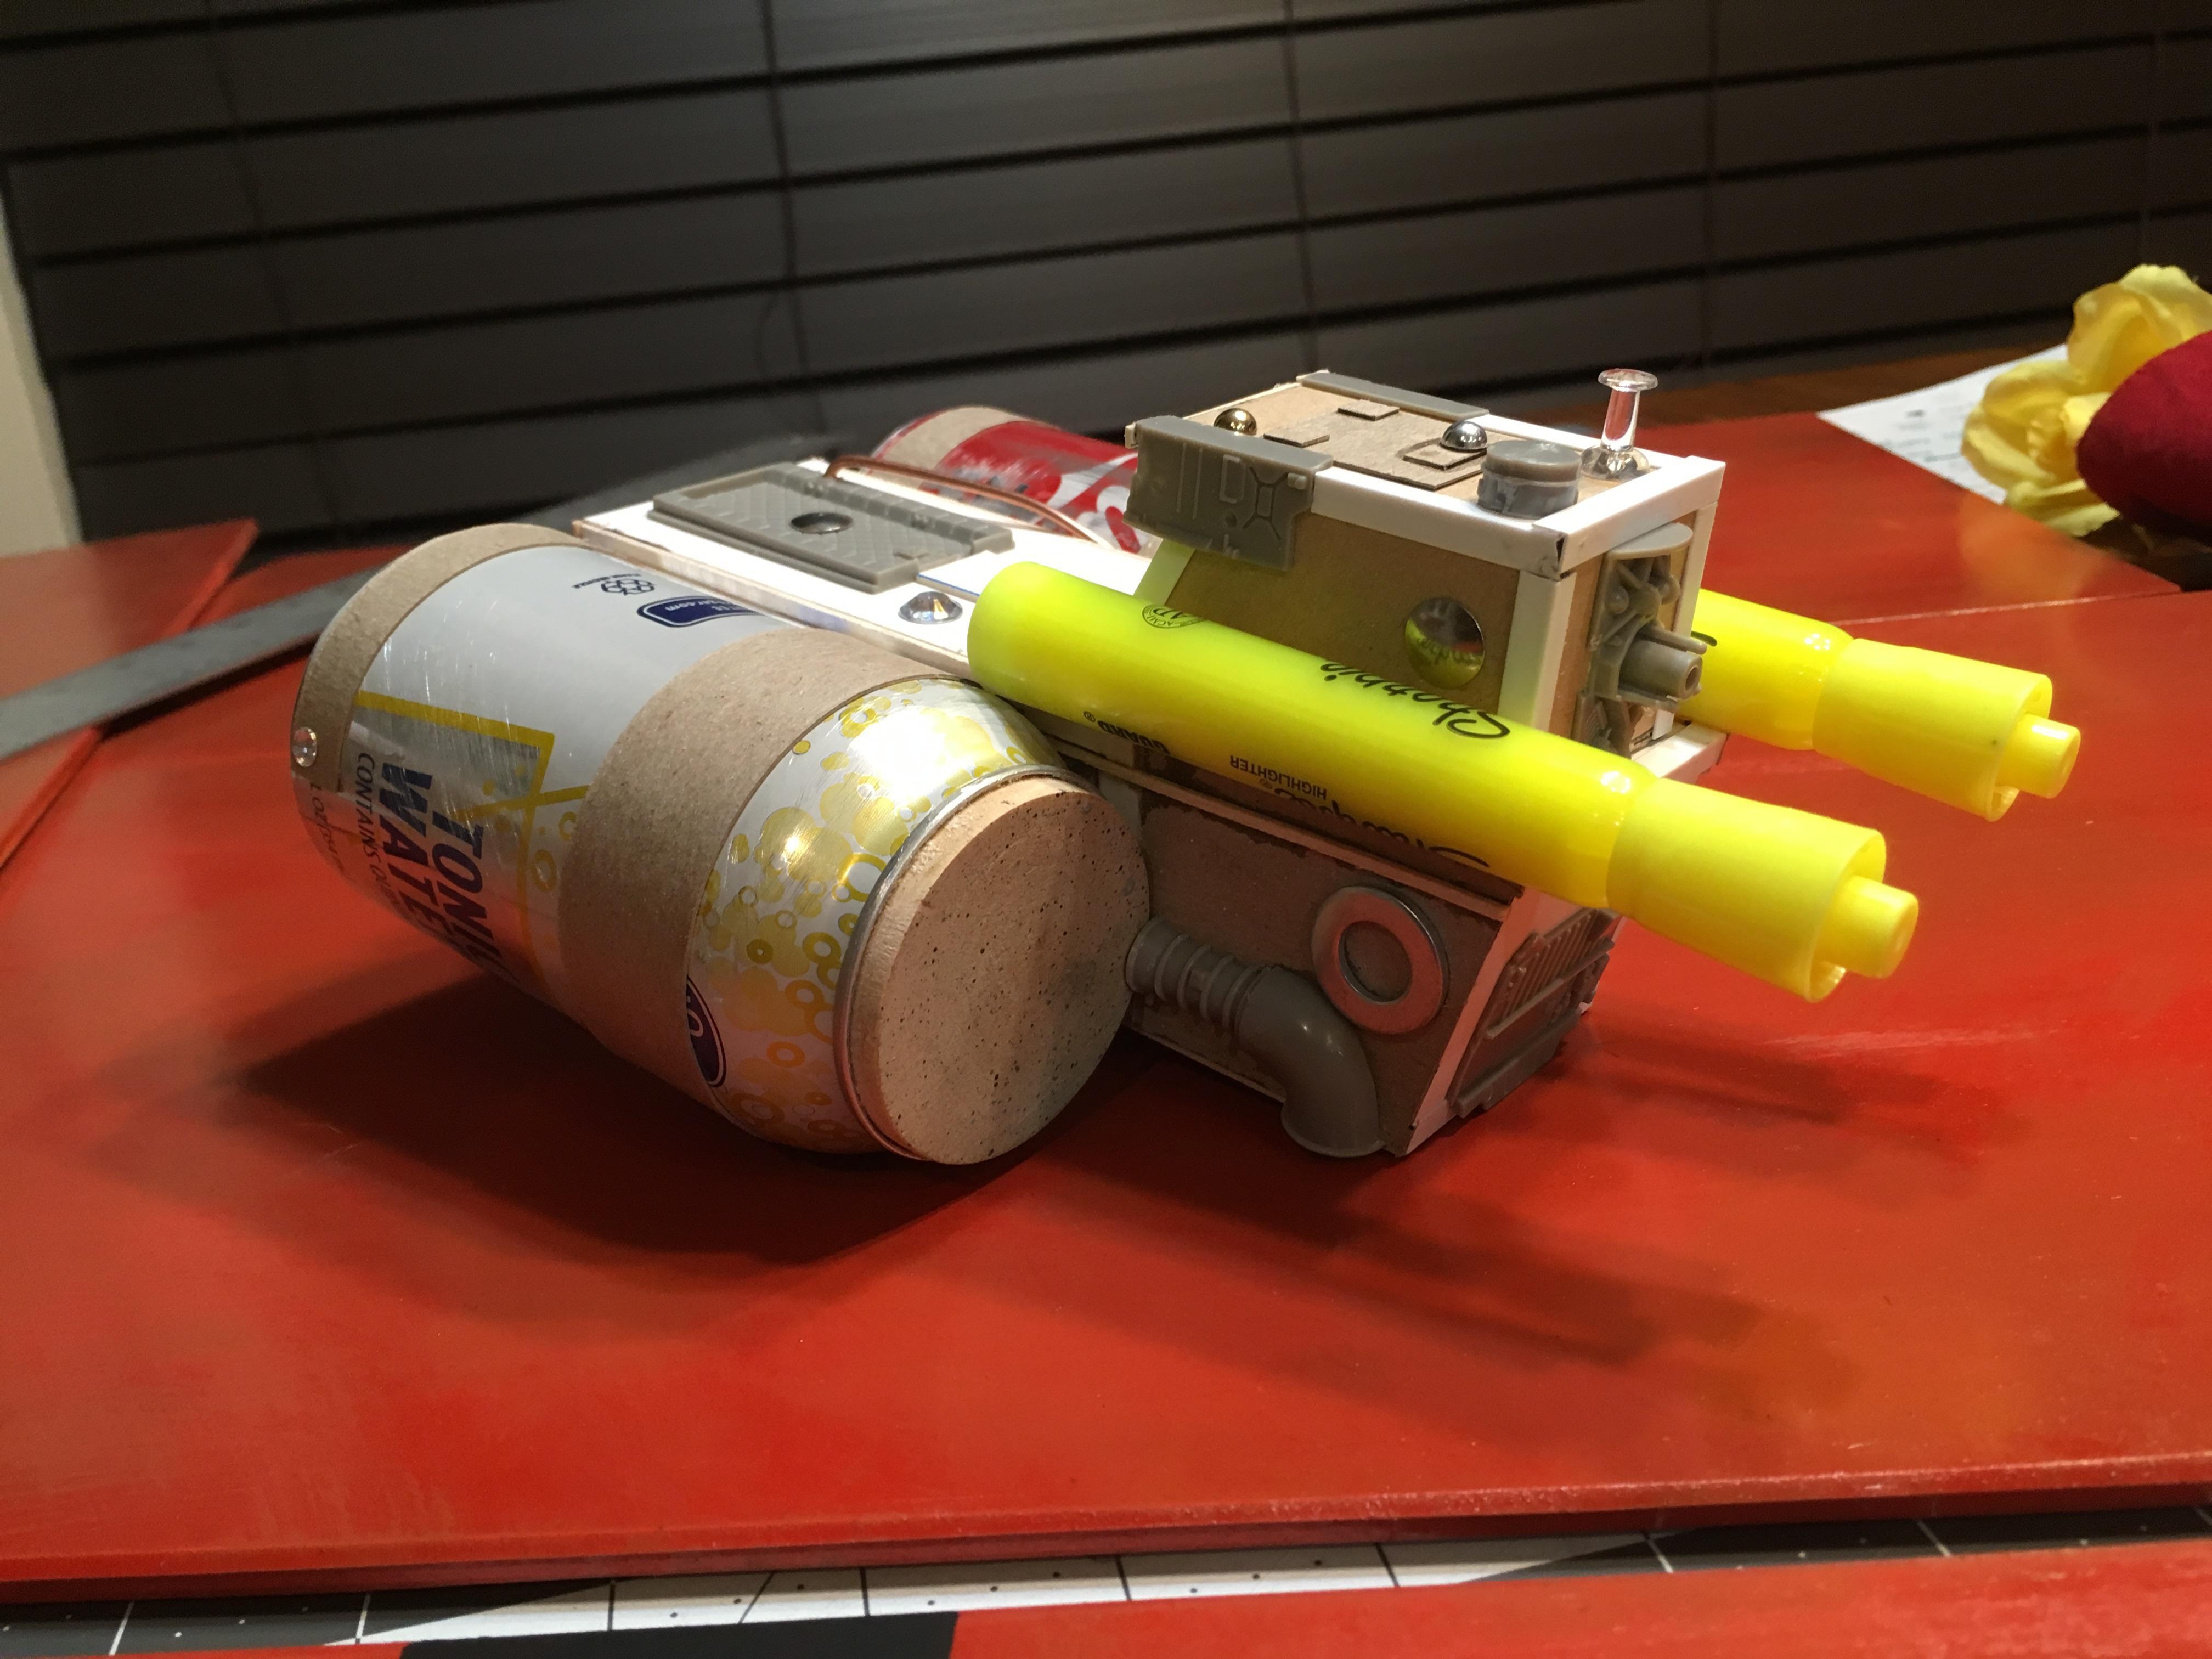 Scratch Build, Shuttle, Space Ship